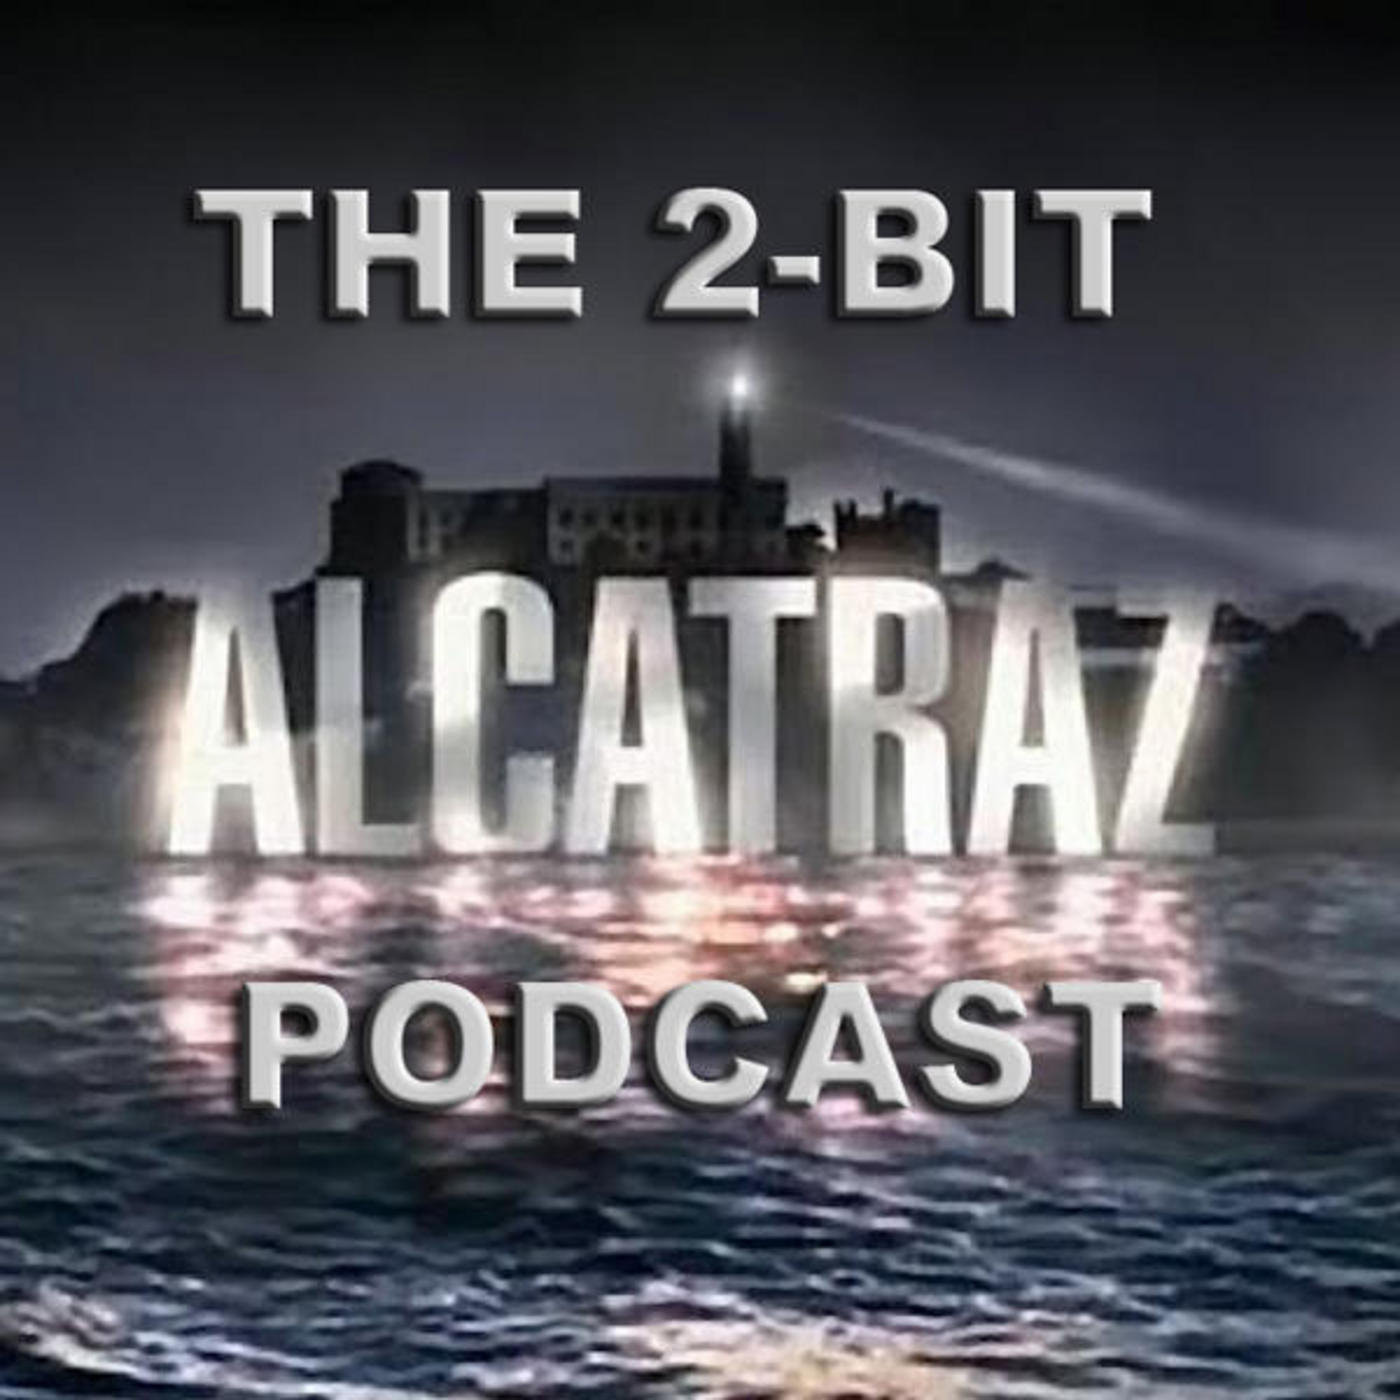 The 2Bit Alcatraz Podcast: Episode 1.12 & 1.13 Tommy Madsen